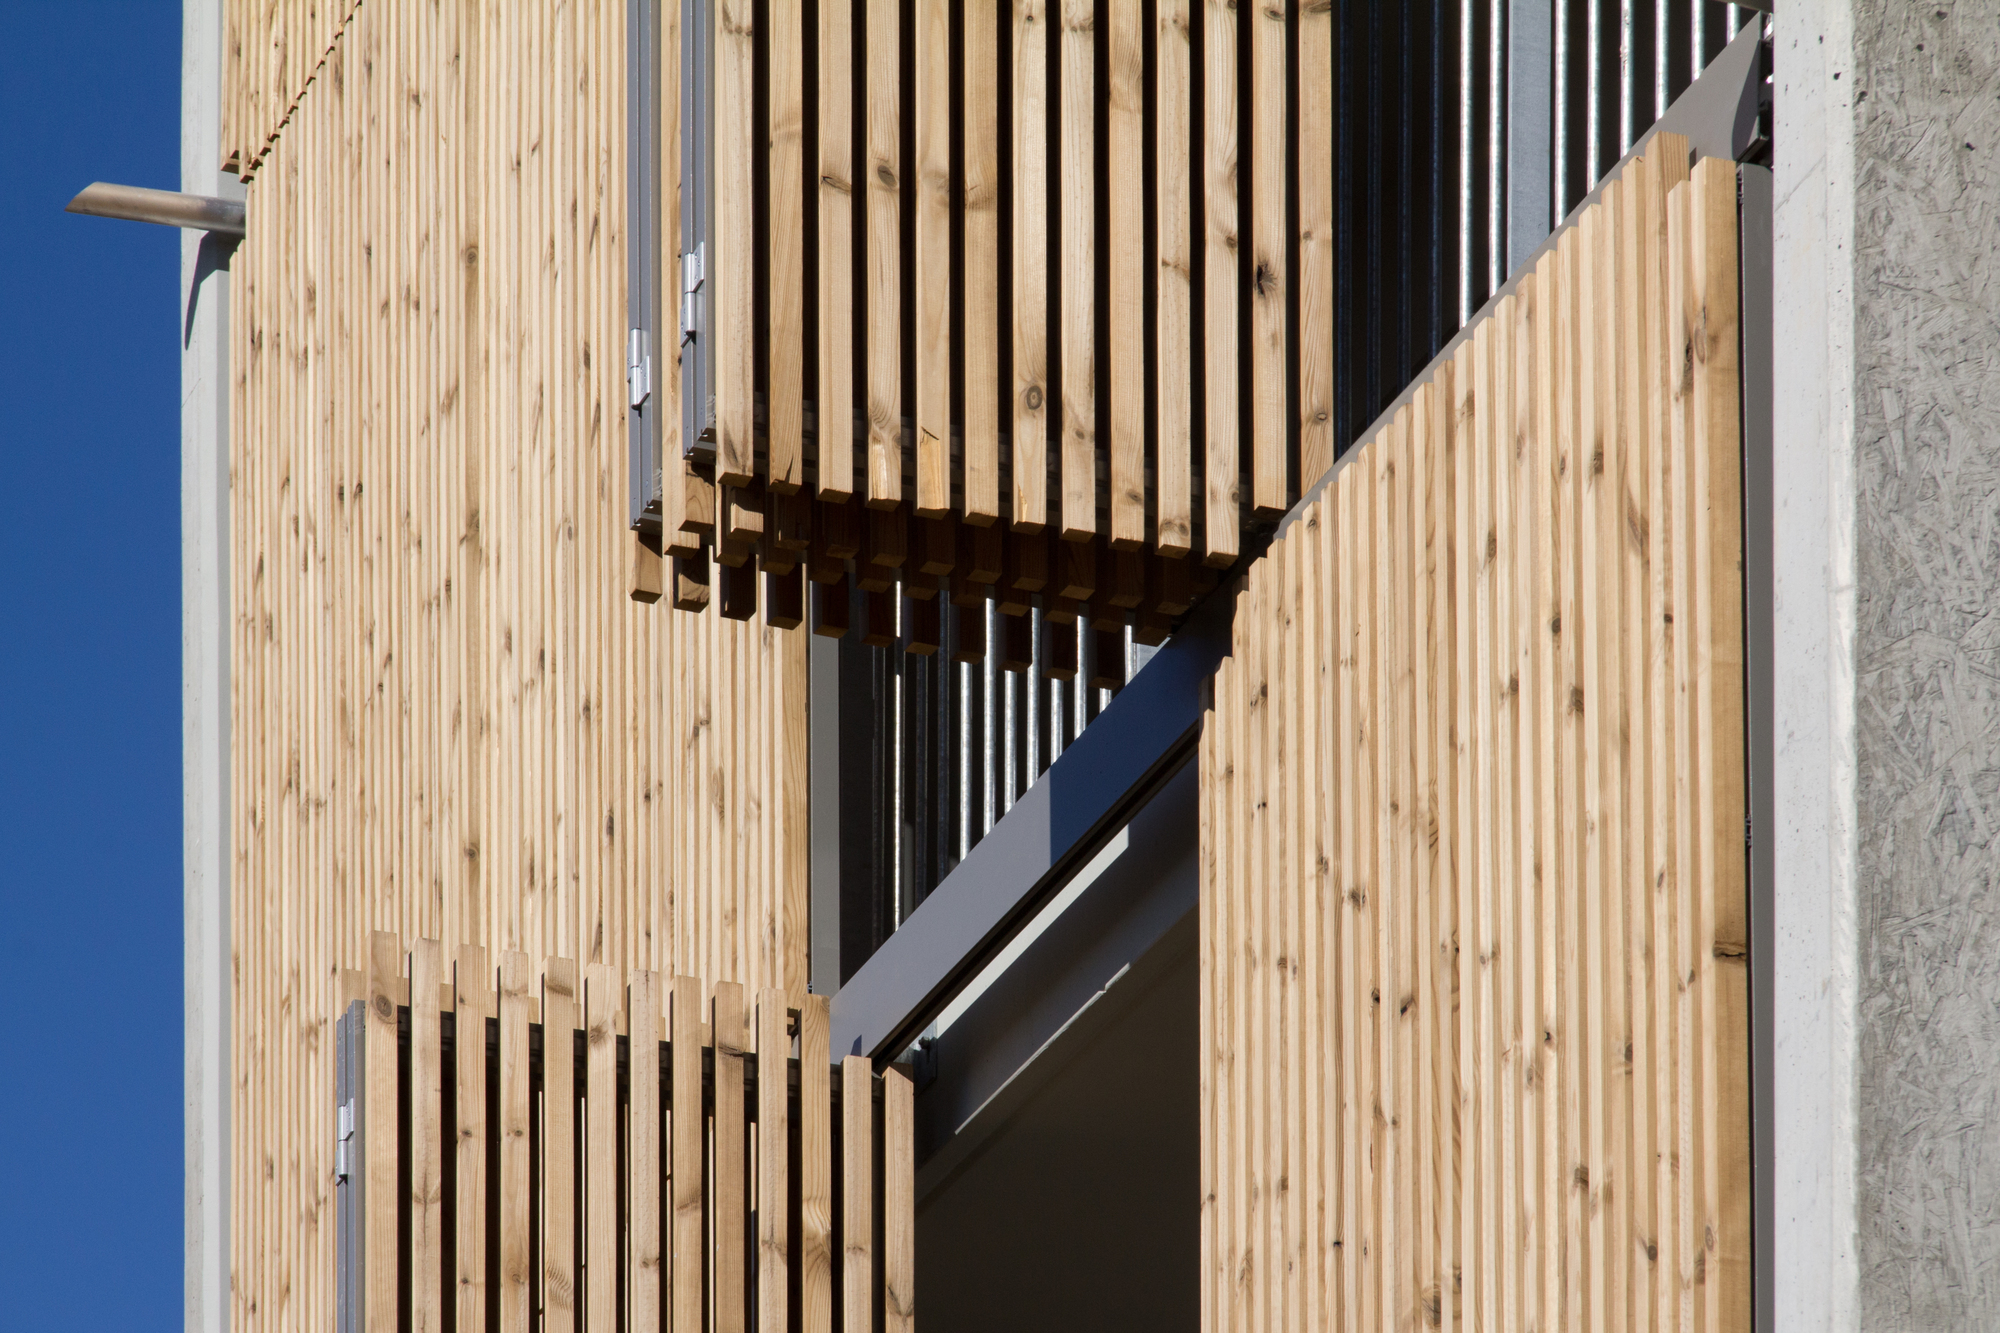 galer a de vivienda social tiendas en mouans sartoux comte et vollenweider architectes 32. Black Bedroom Furniture Sets. Home Design Ideas